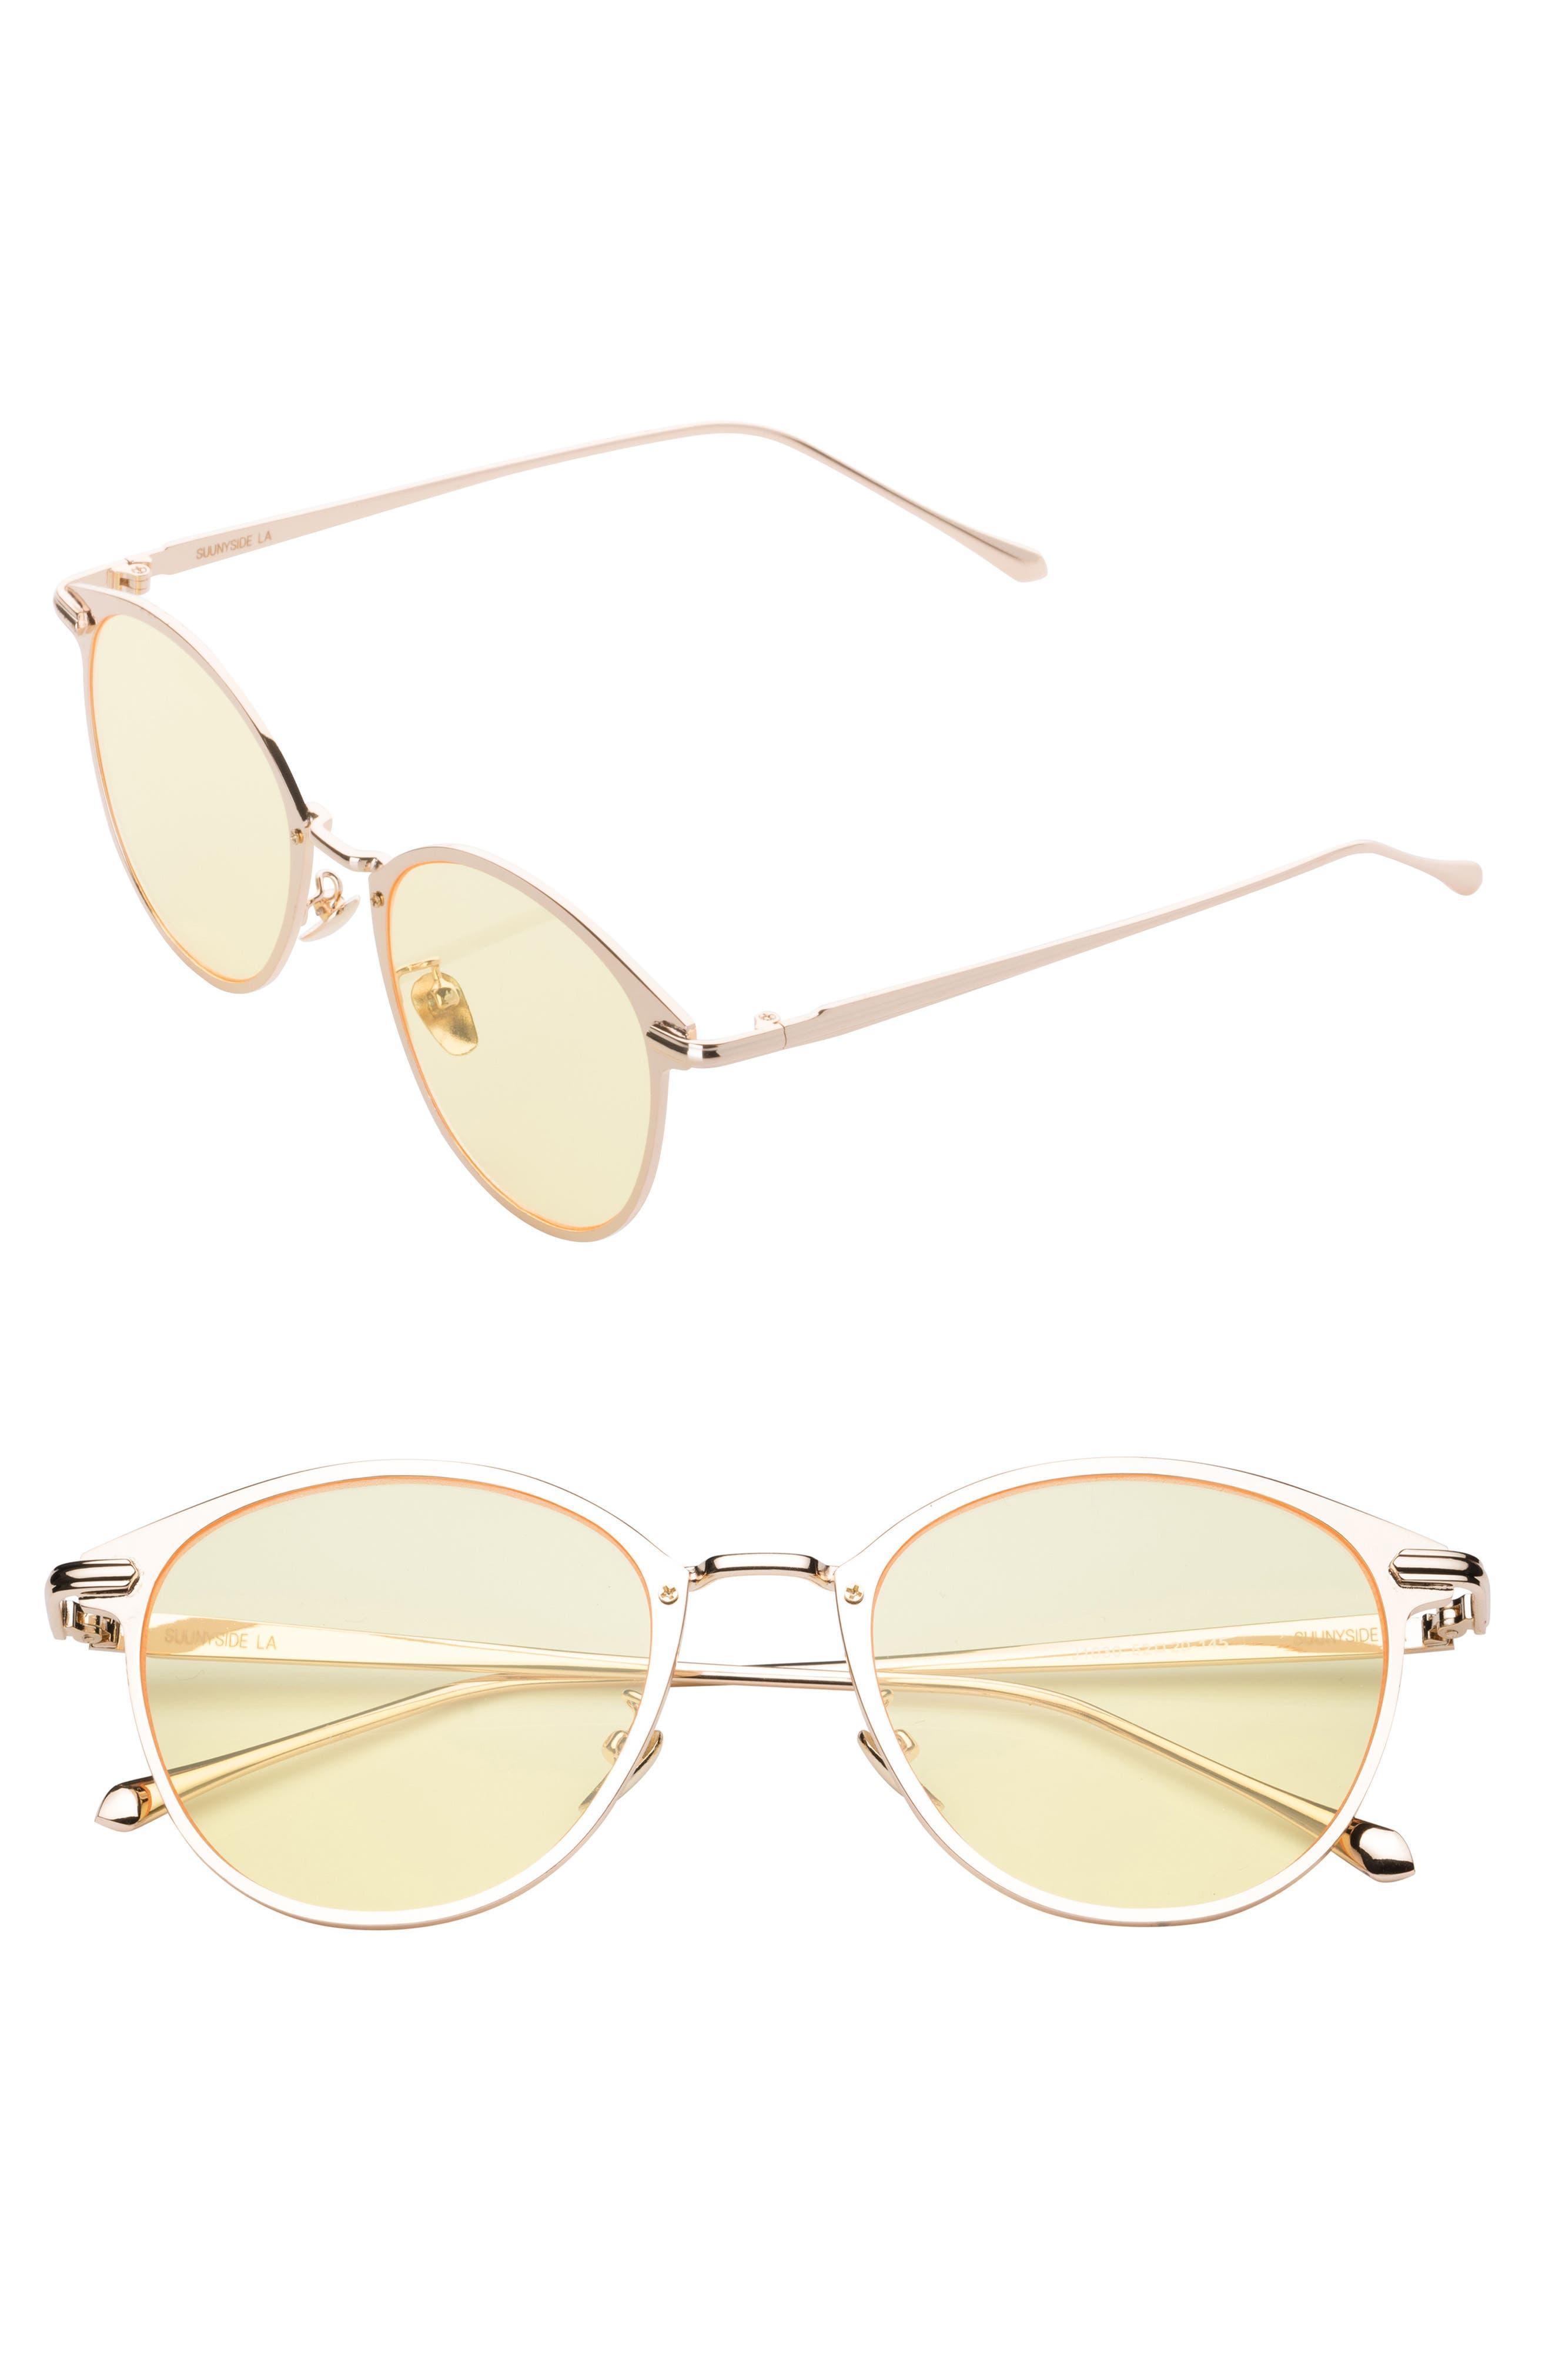 51mm Oxford Sunglasses,                             Main thumbnail 1, color,                             700